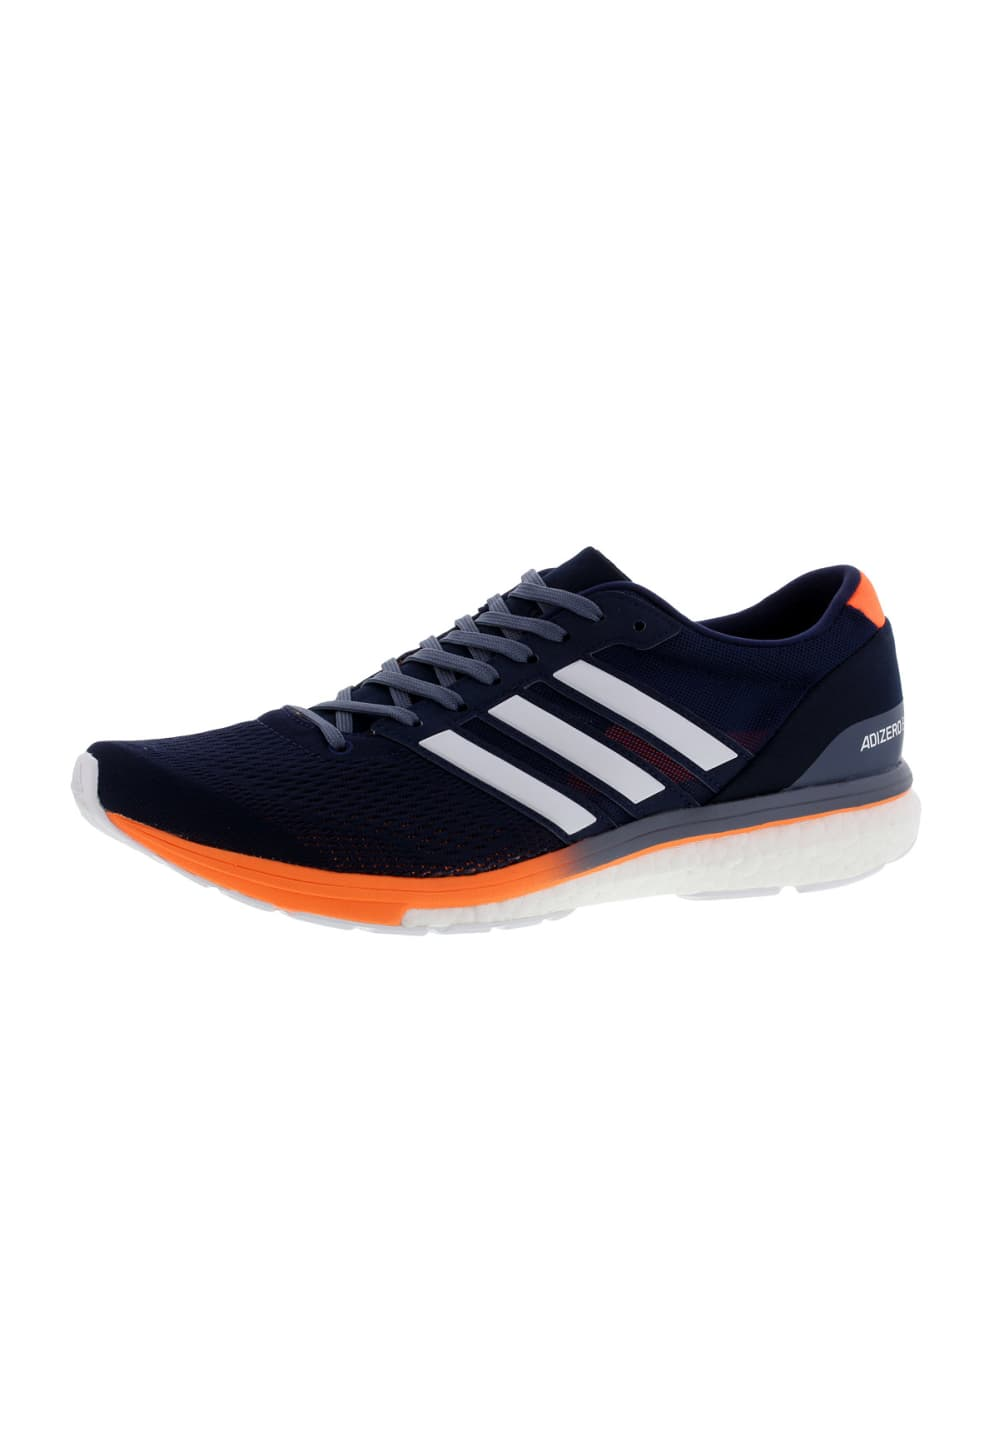 adidas adiZero Boston 6 Chaussures running pour Homme Noir